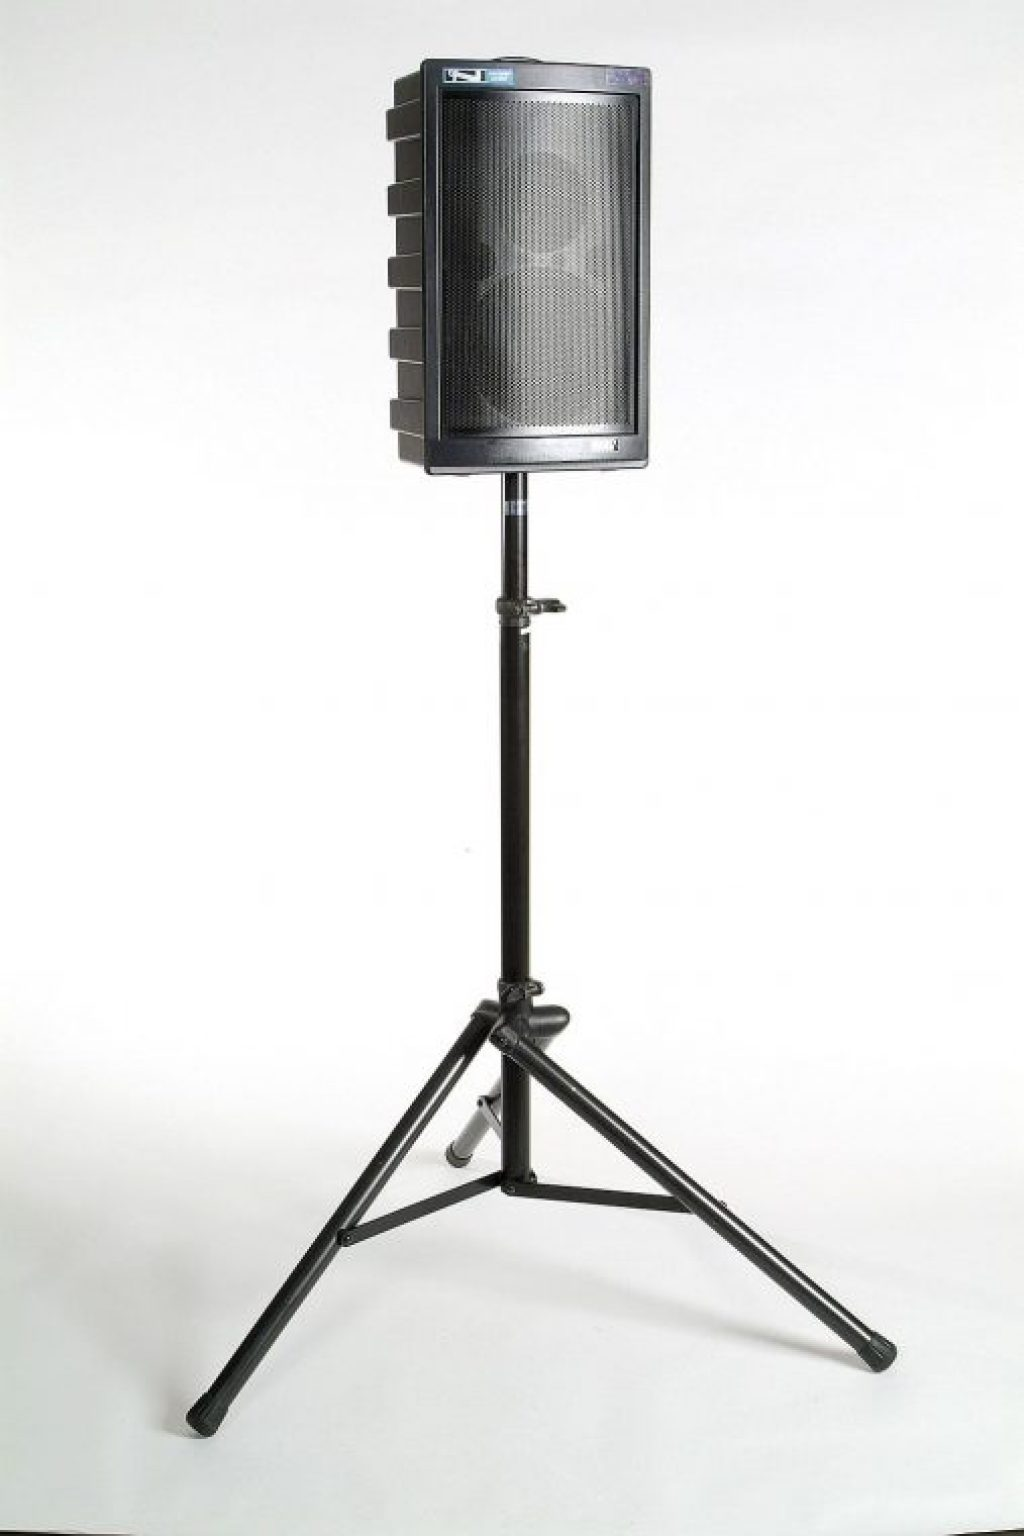 PA speaker rental